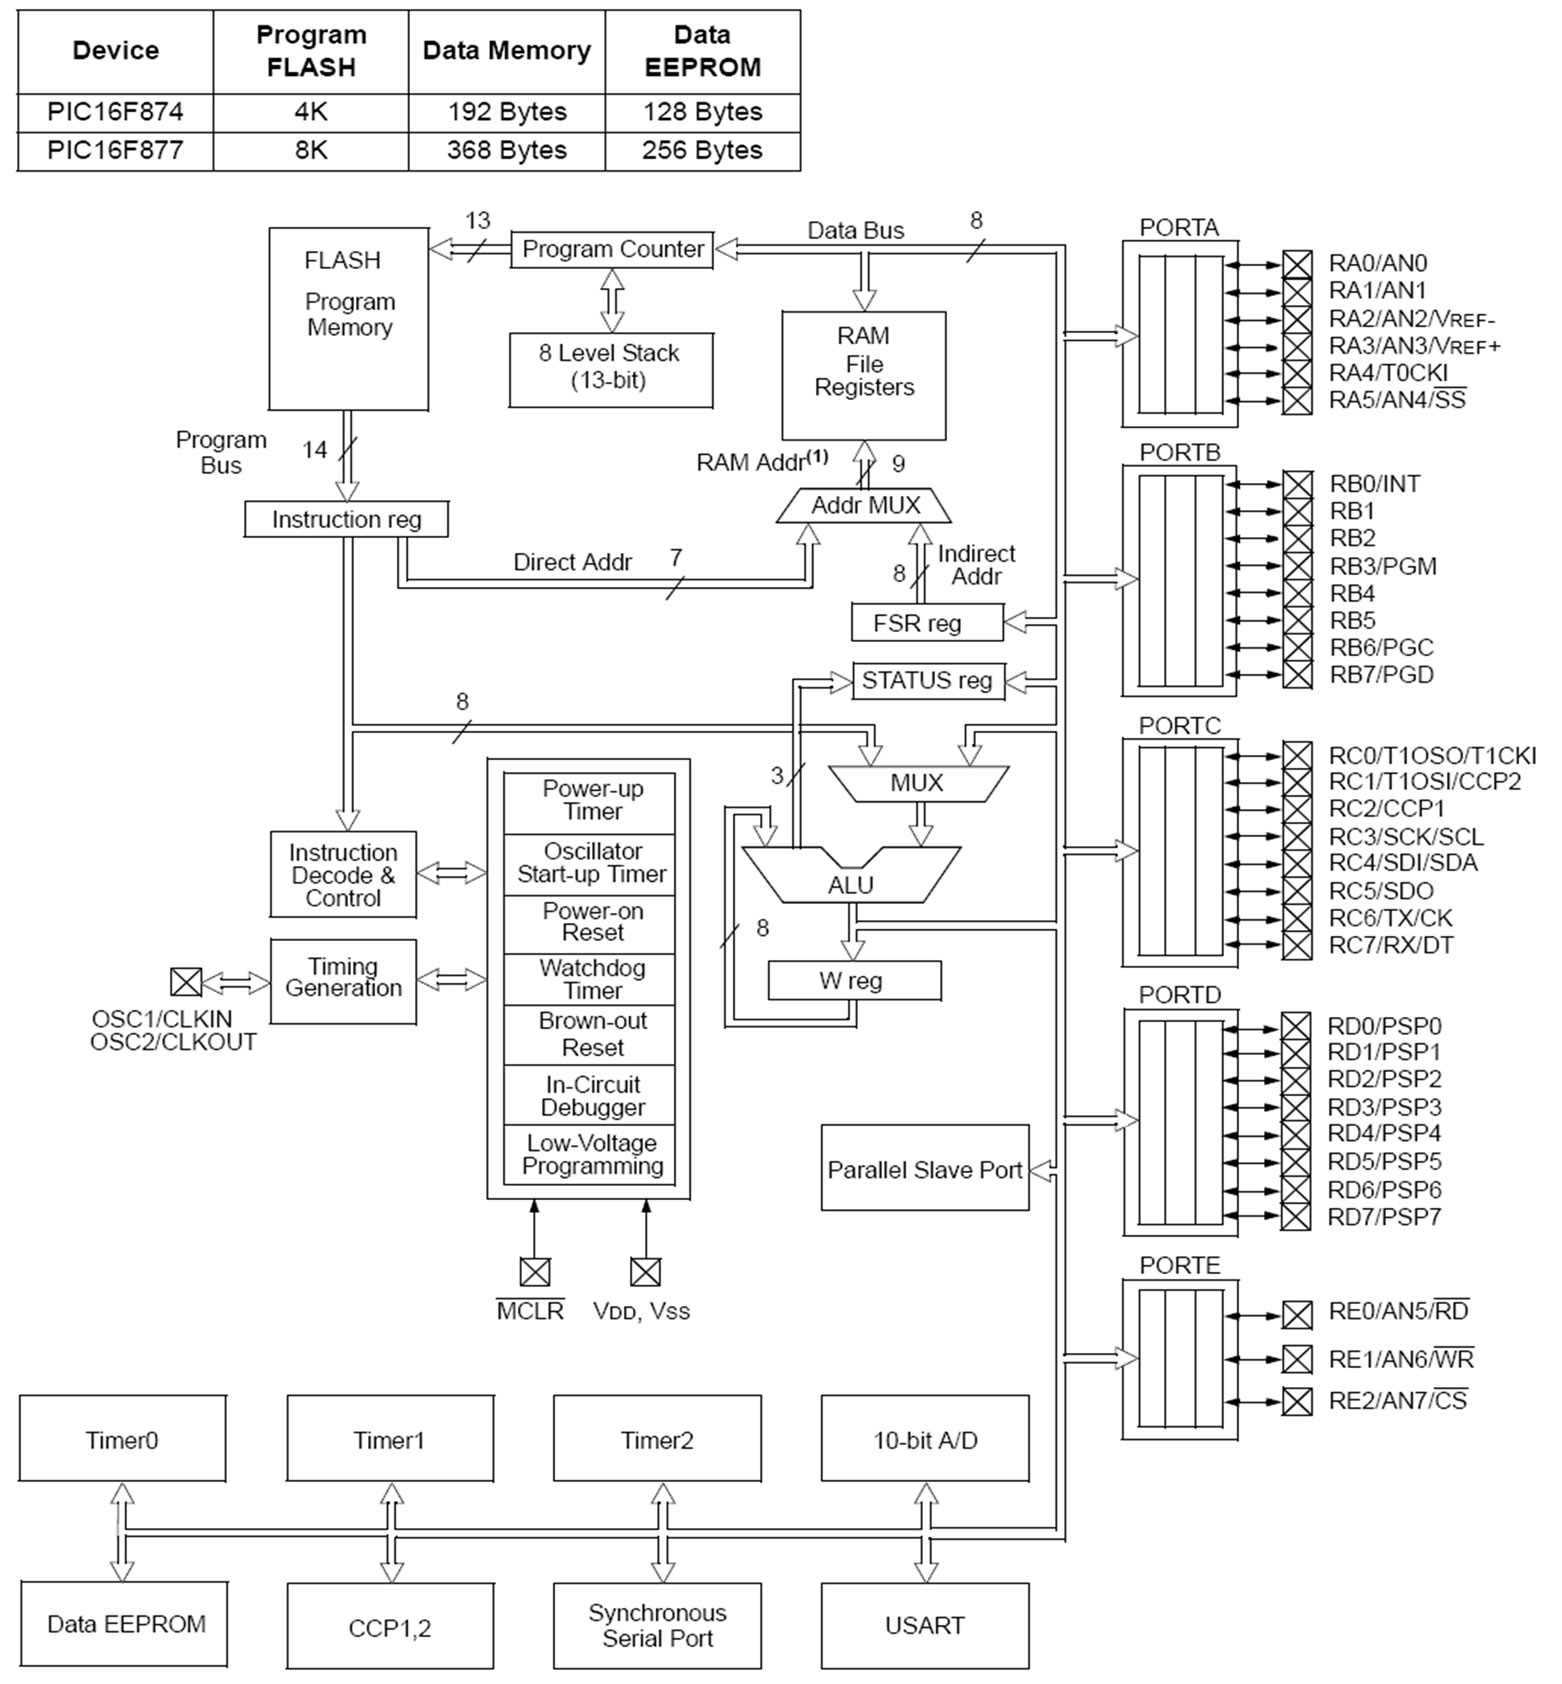 Pic Microcontroller 16f877 Block Diagram Explanation